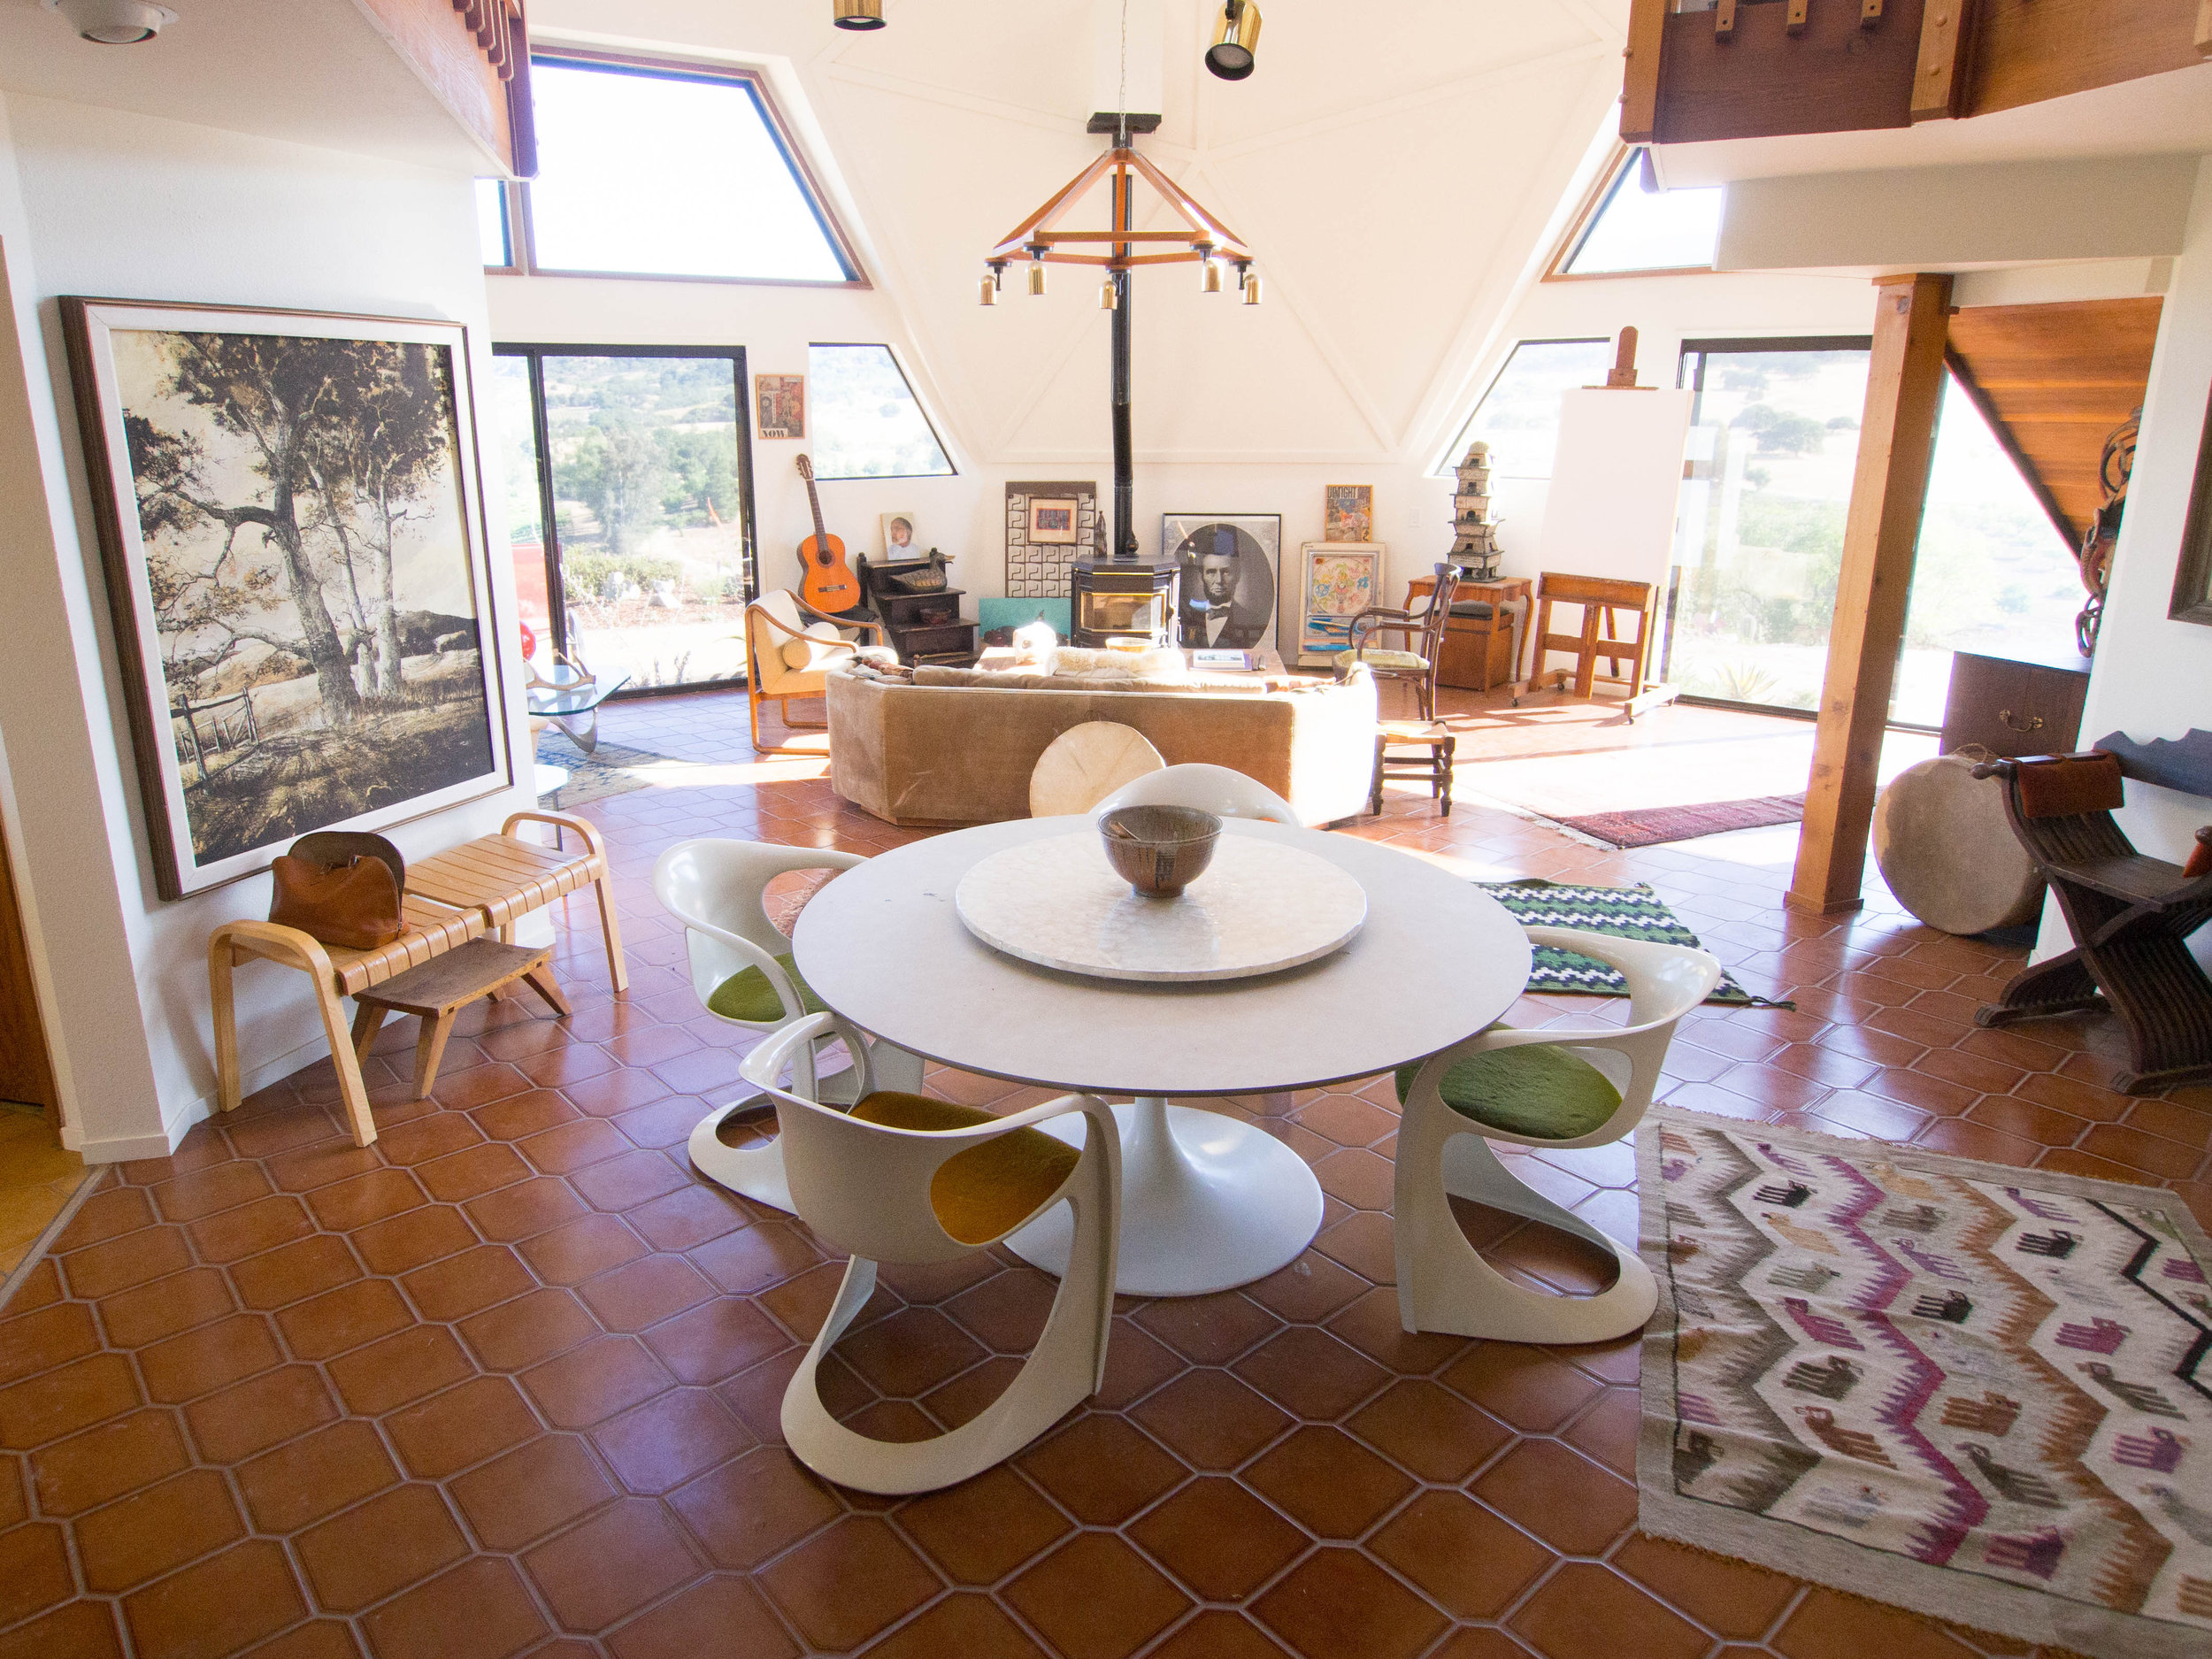 dome.livingroom.jpg